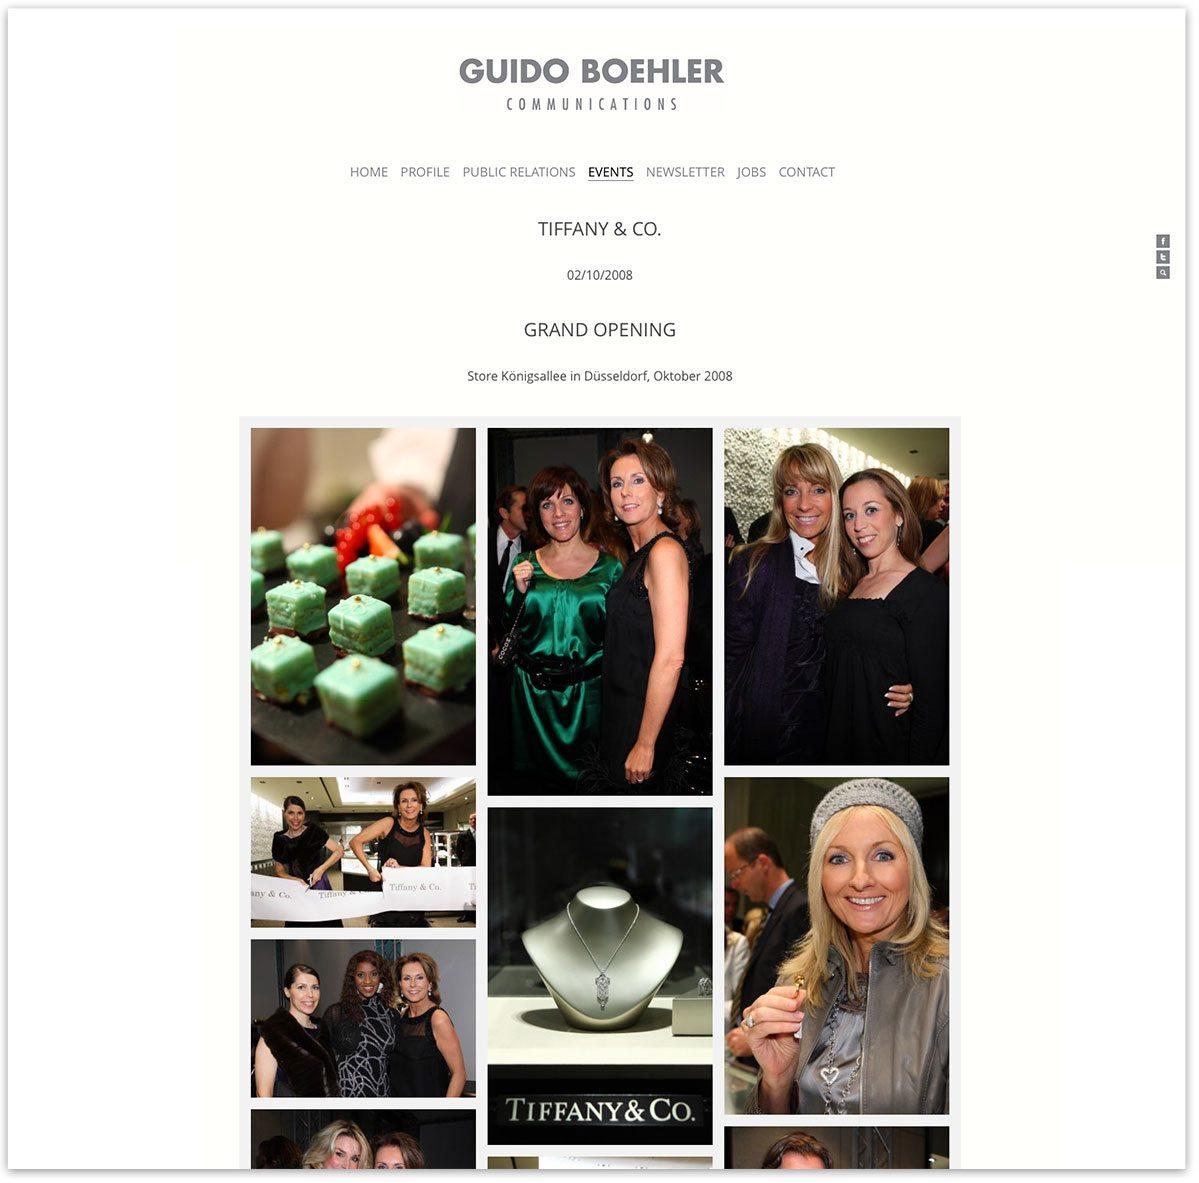 Guido Boehler Communications Website